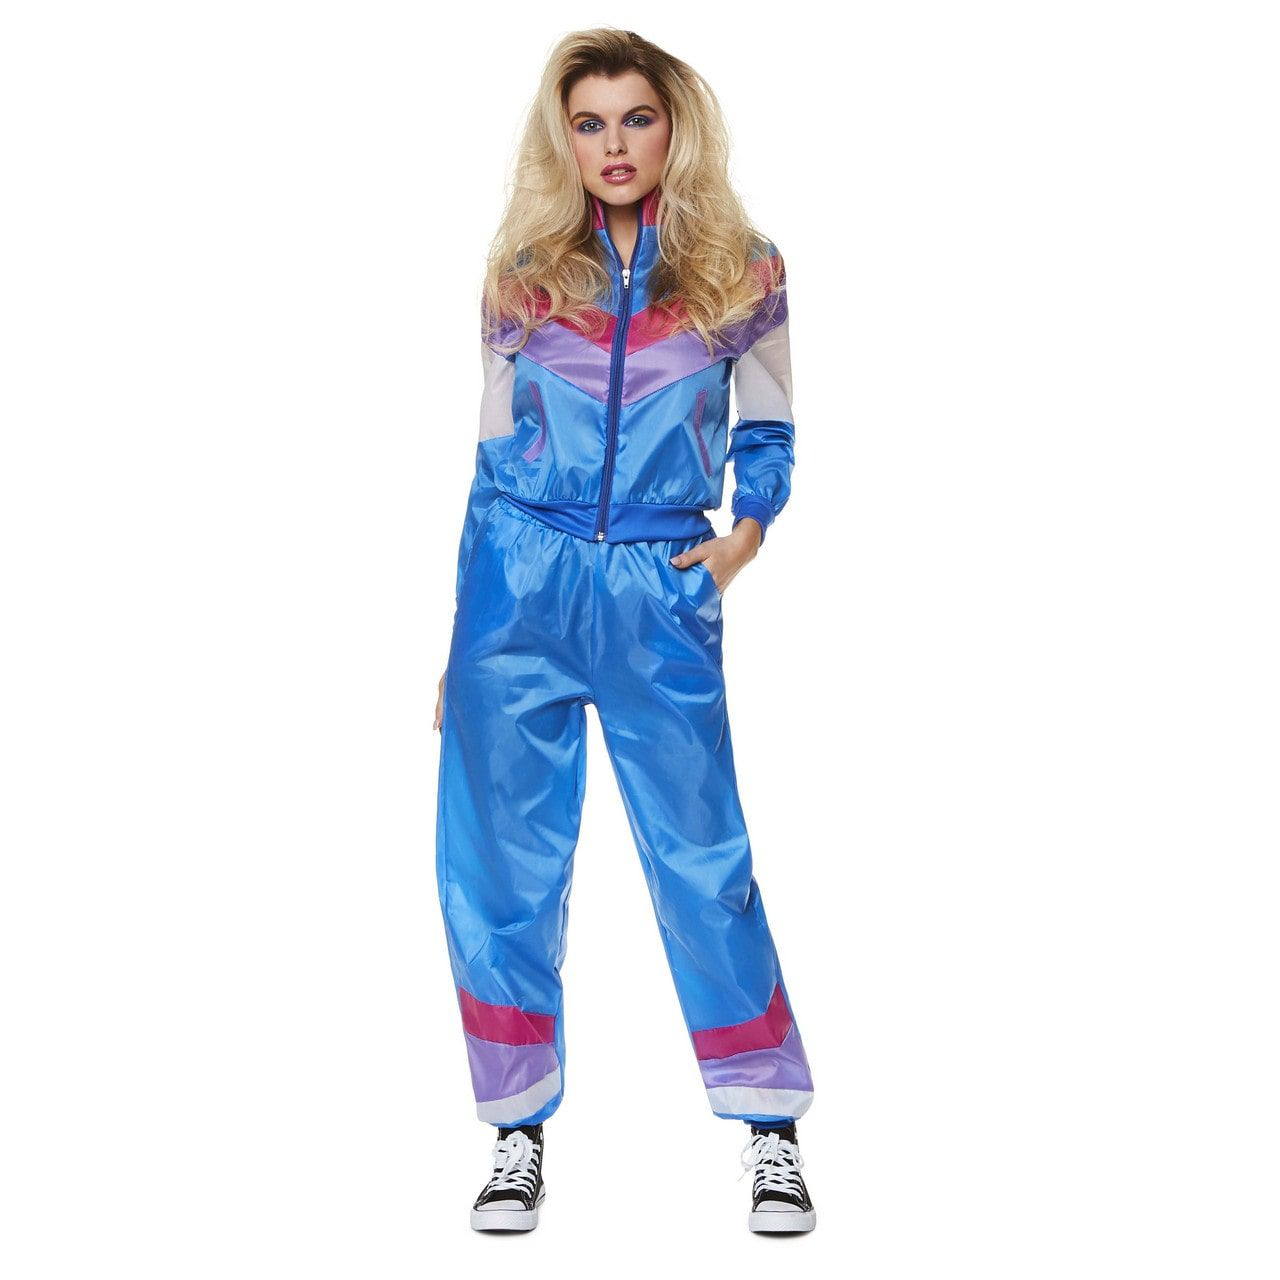 Wat Nou Fout Trainingspak Vrouw Kostuum